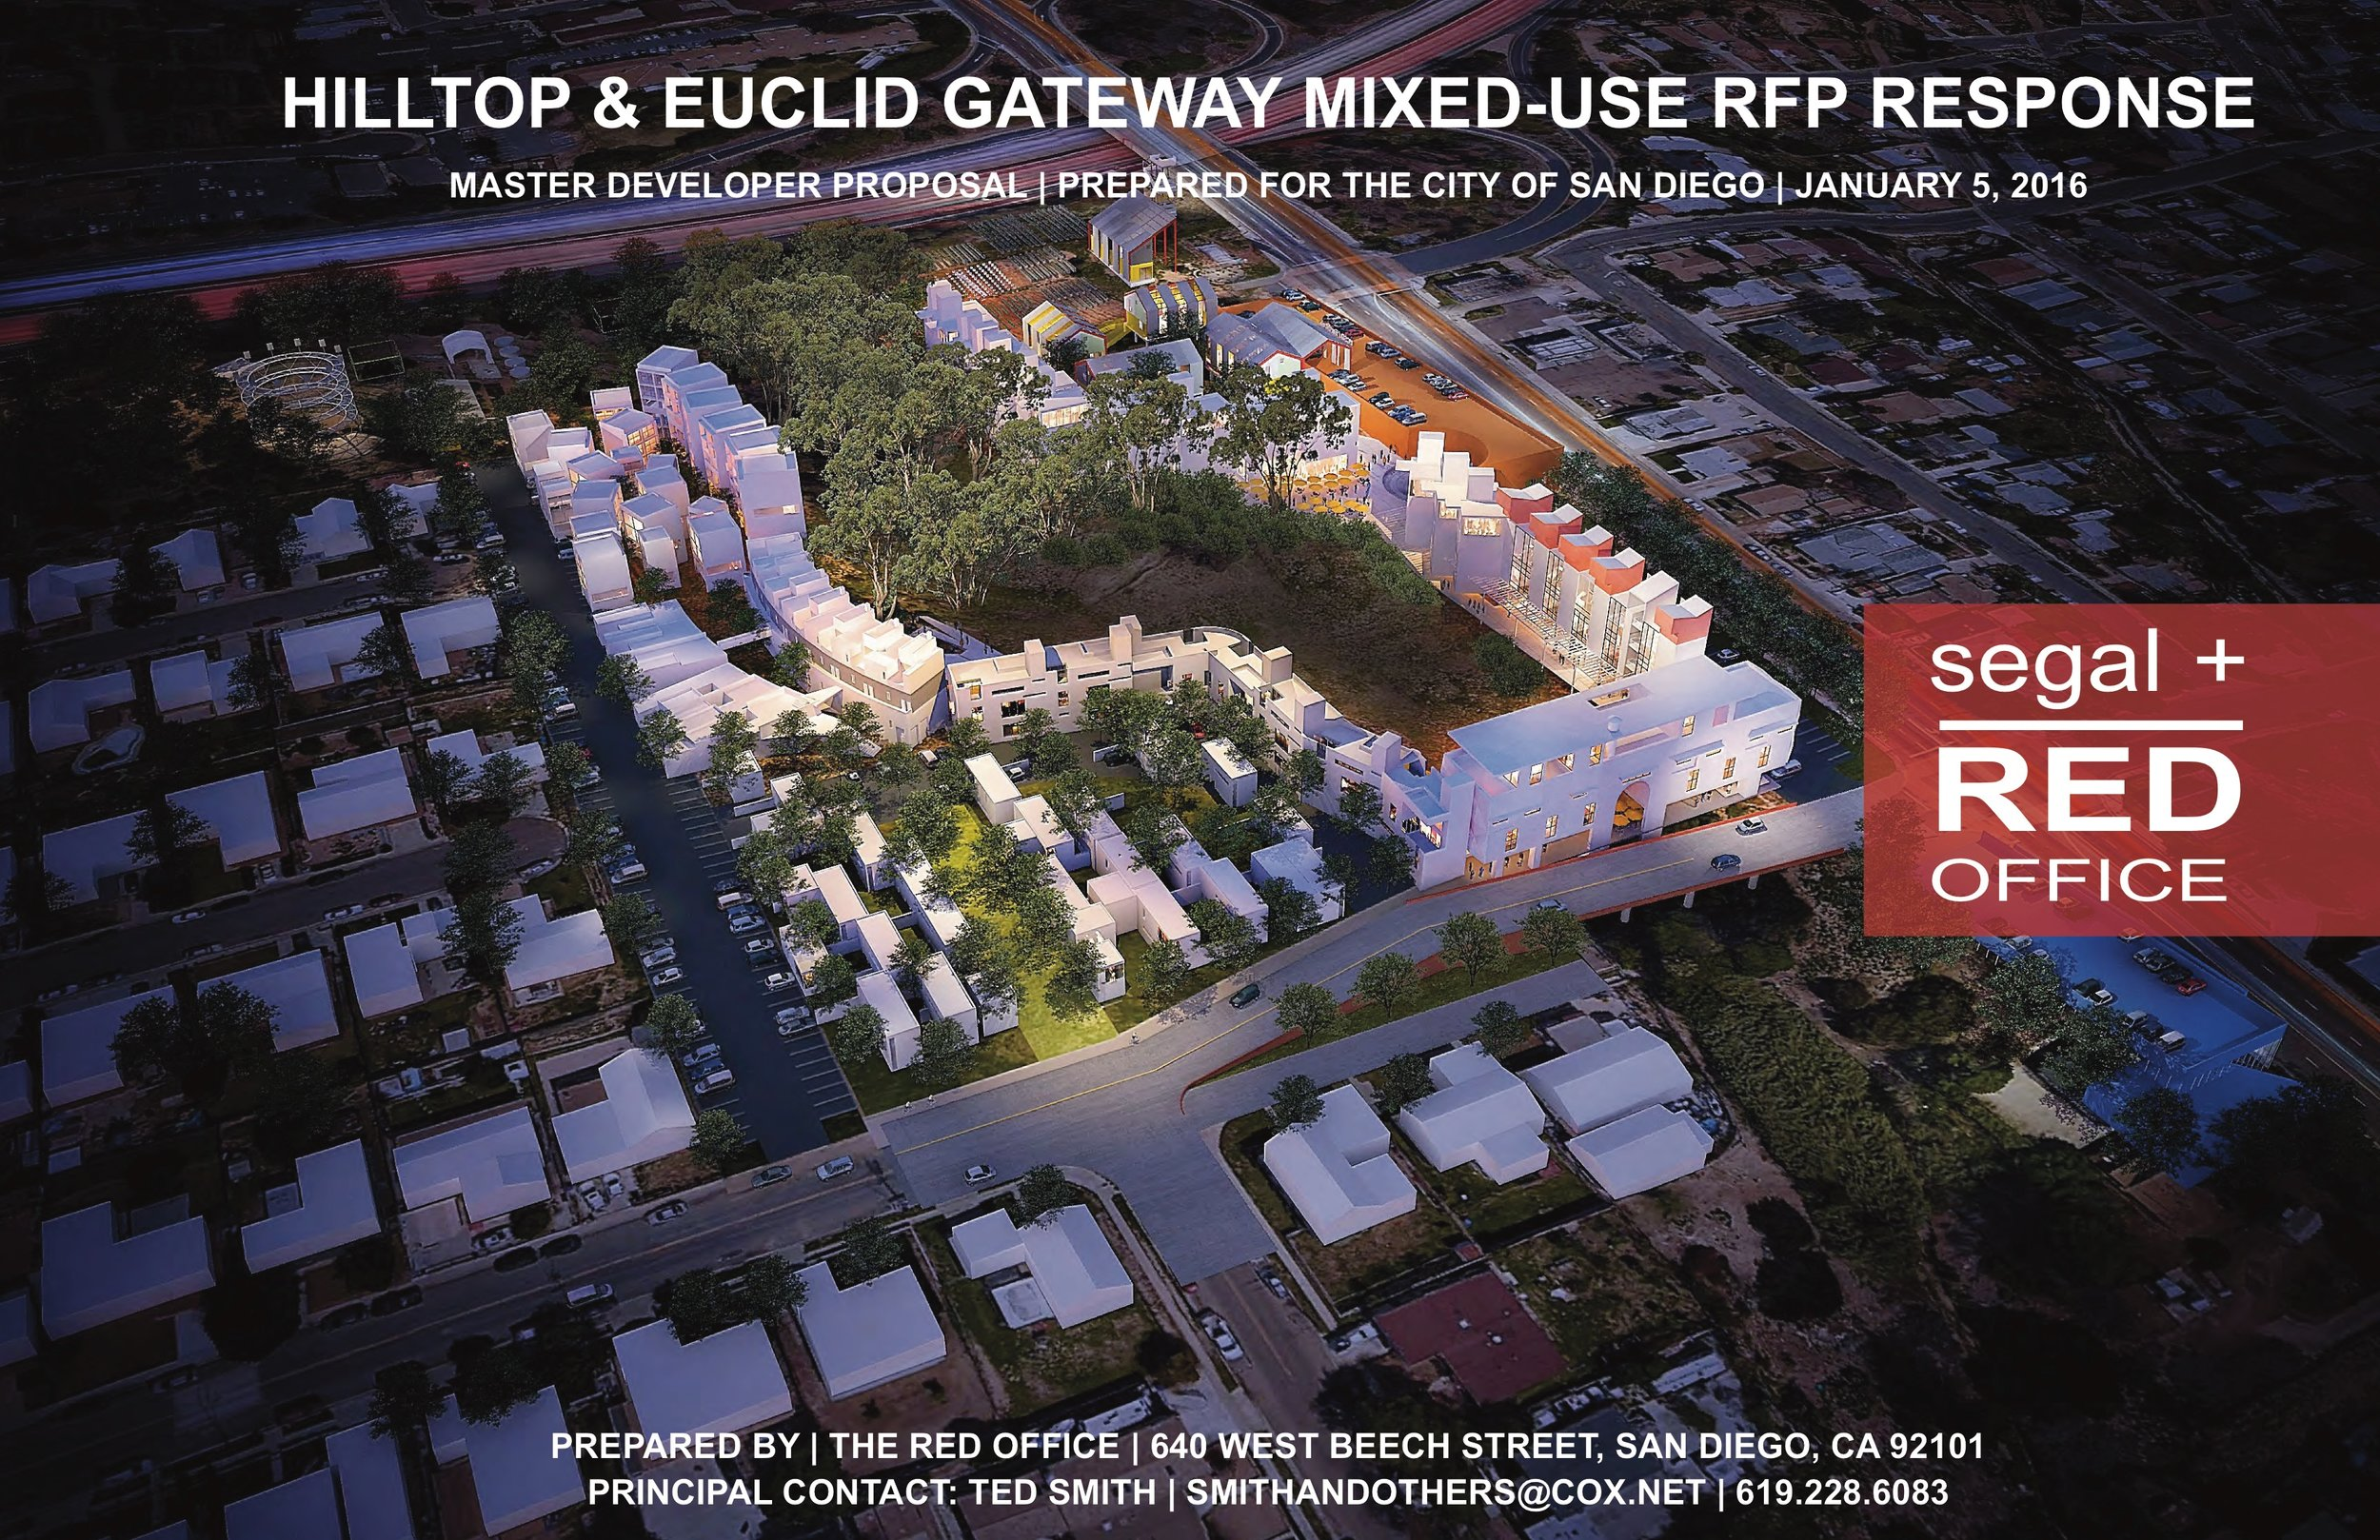 Hilltop and Euclid Mixed Use RFP Response